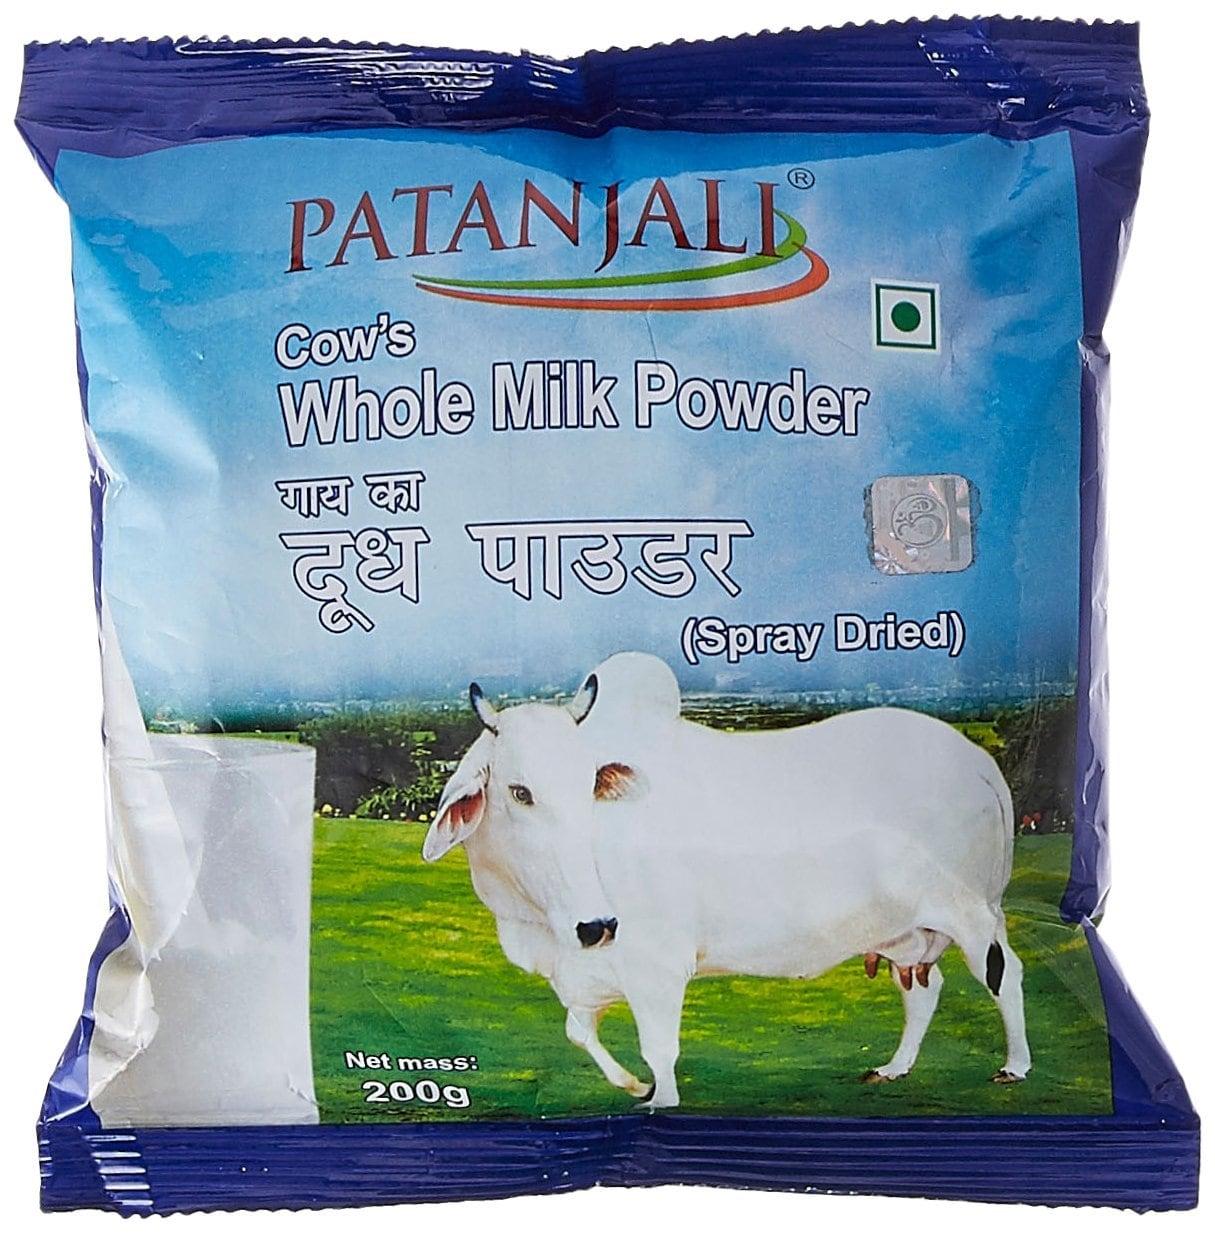 Patanjali Cow's Whole Milk Powder 200 Gm